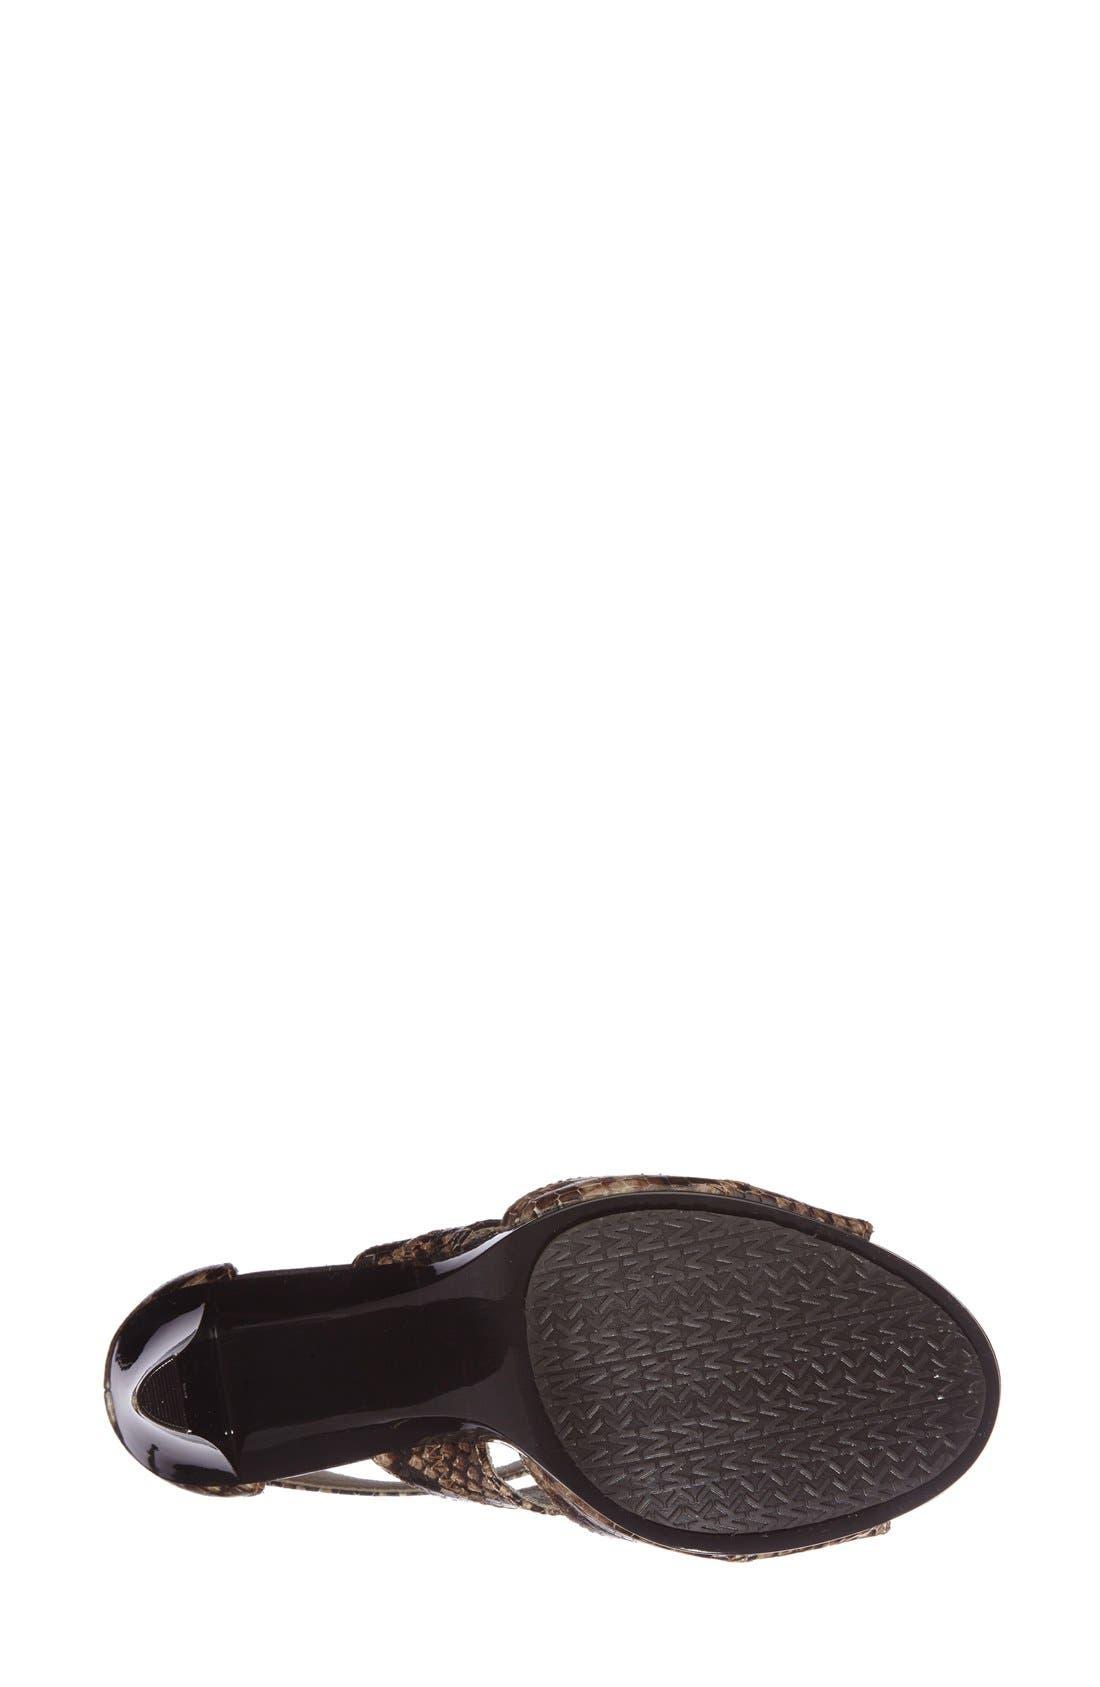 'Berkley' T-Strap Sandal,                             Alternate thumbnail 68, color,